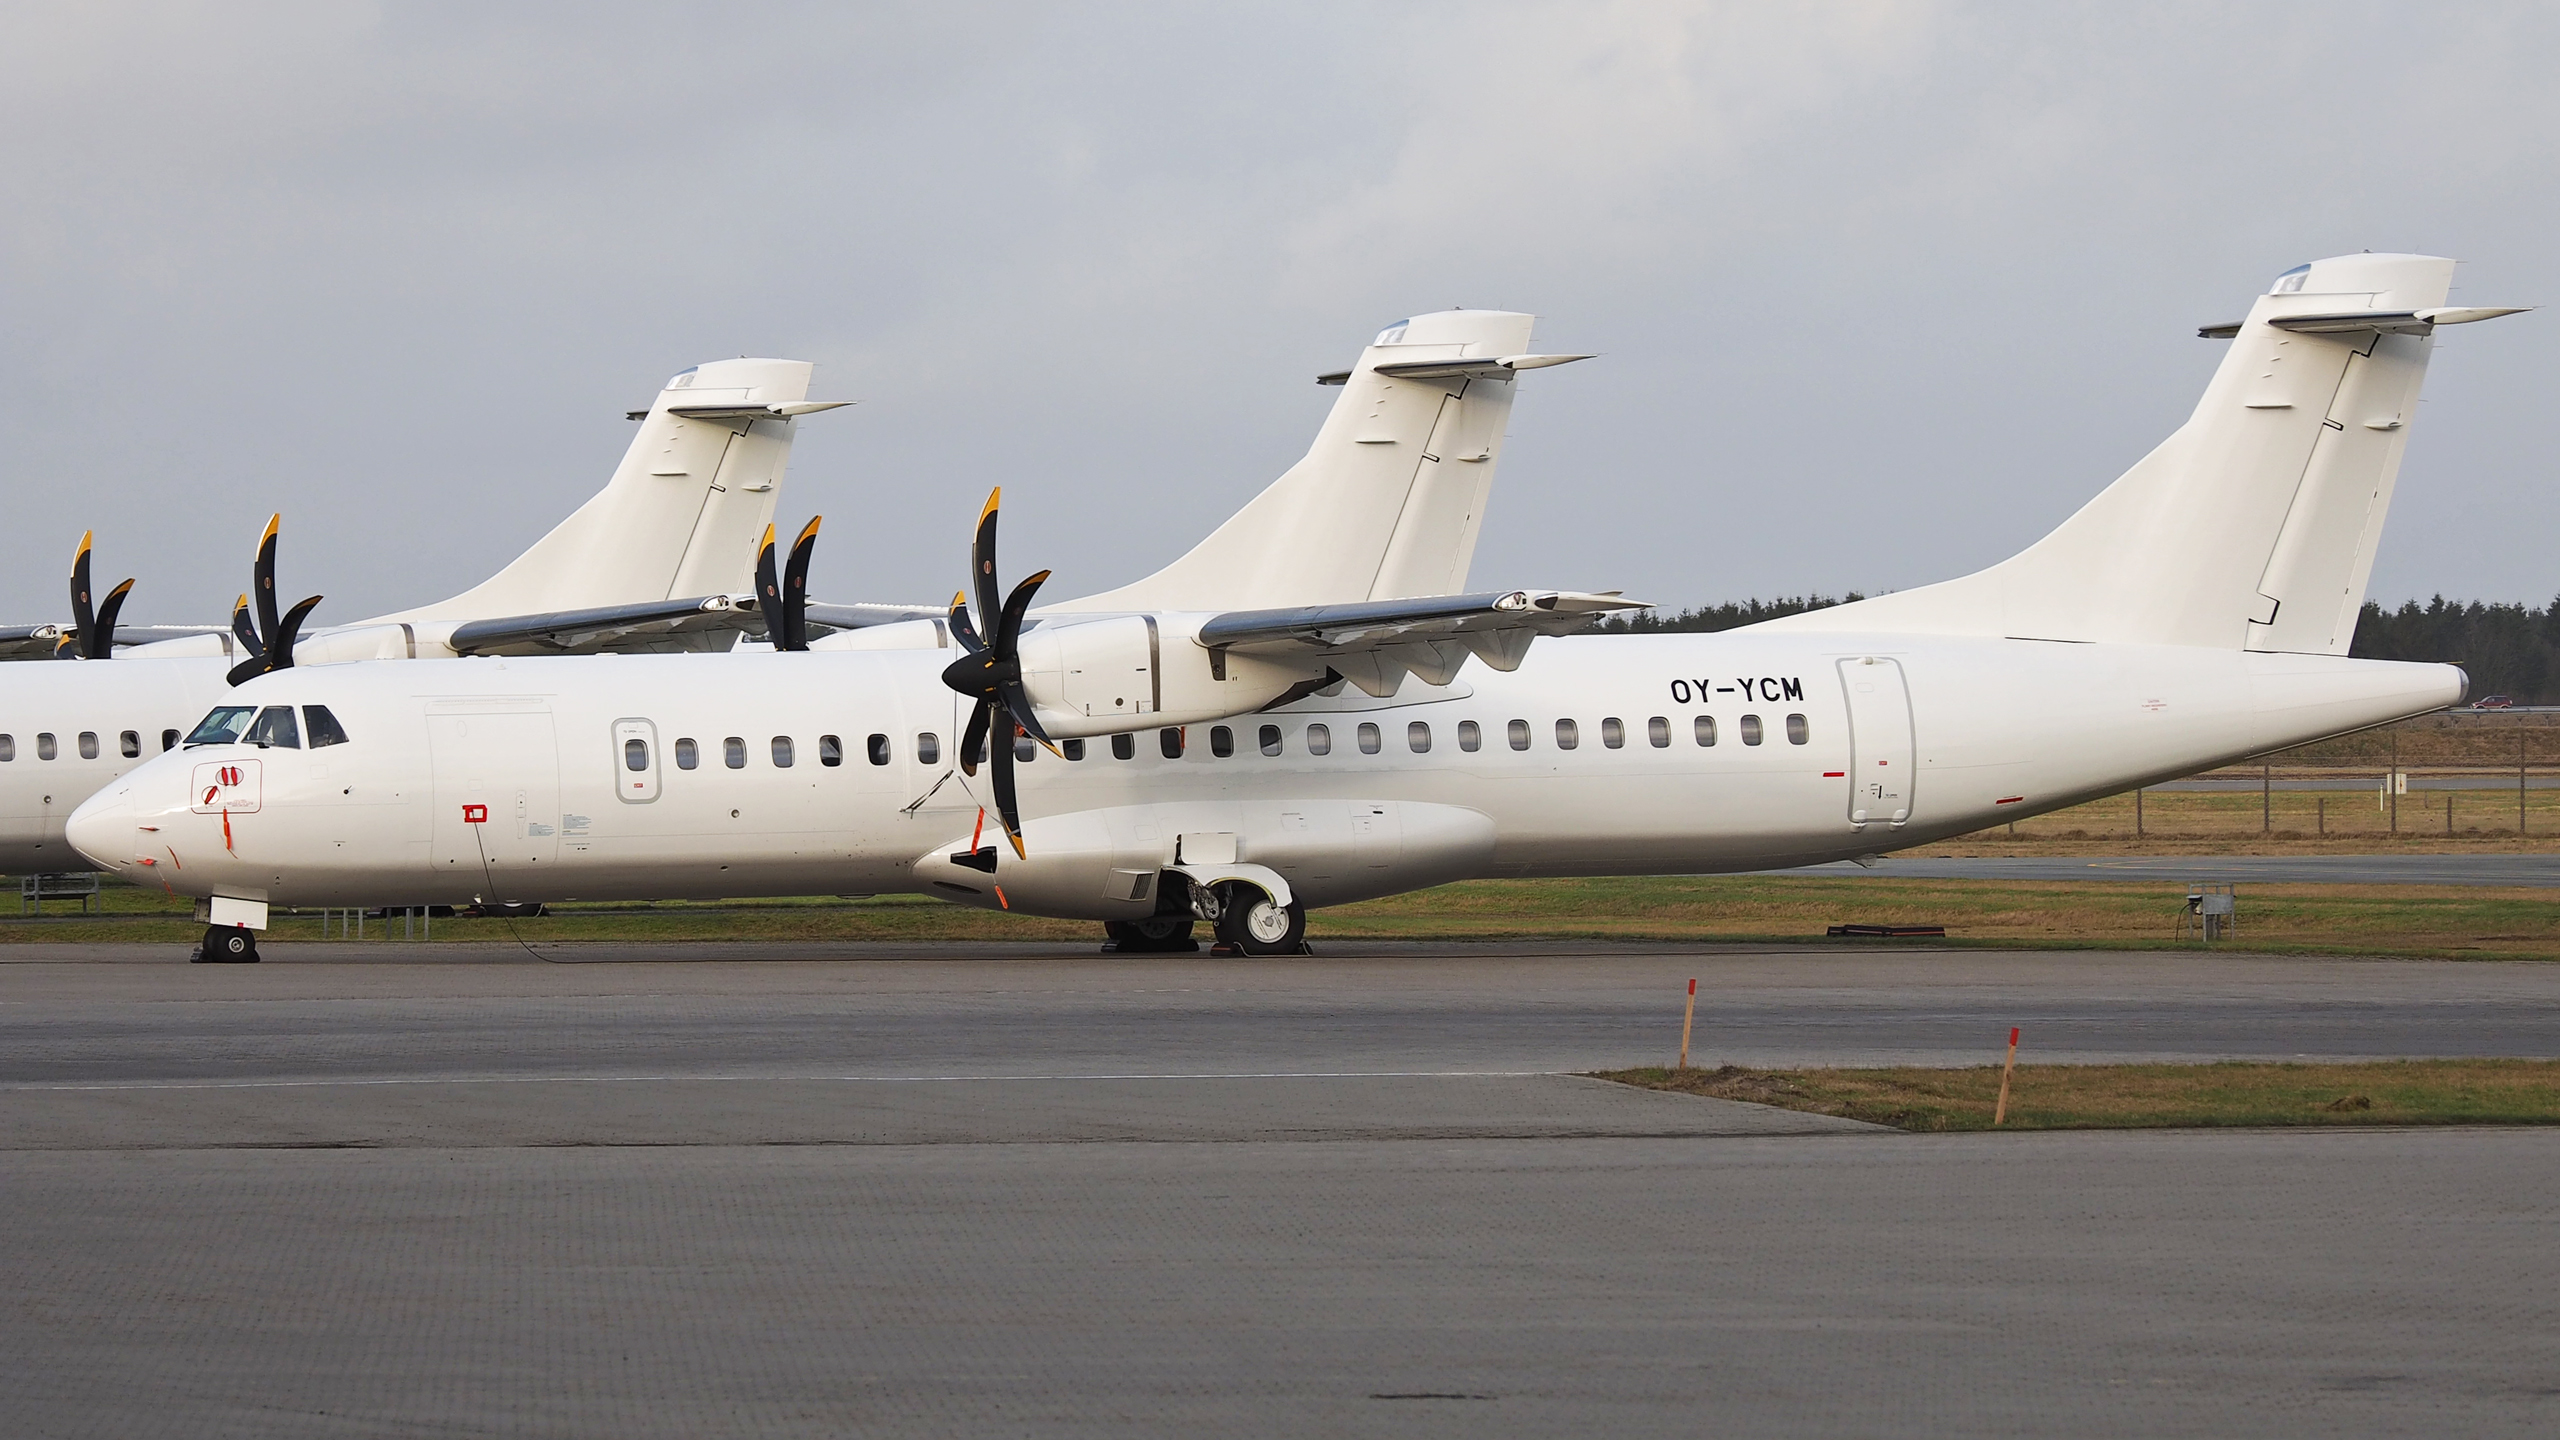 Nye ATR72-600 hos Nordic Capital Aviation i Billund. (Foto: Erik Gjørup – SAIcollection)